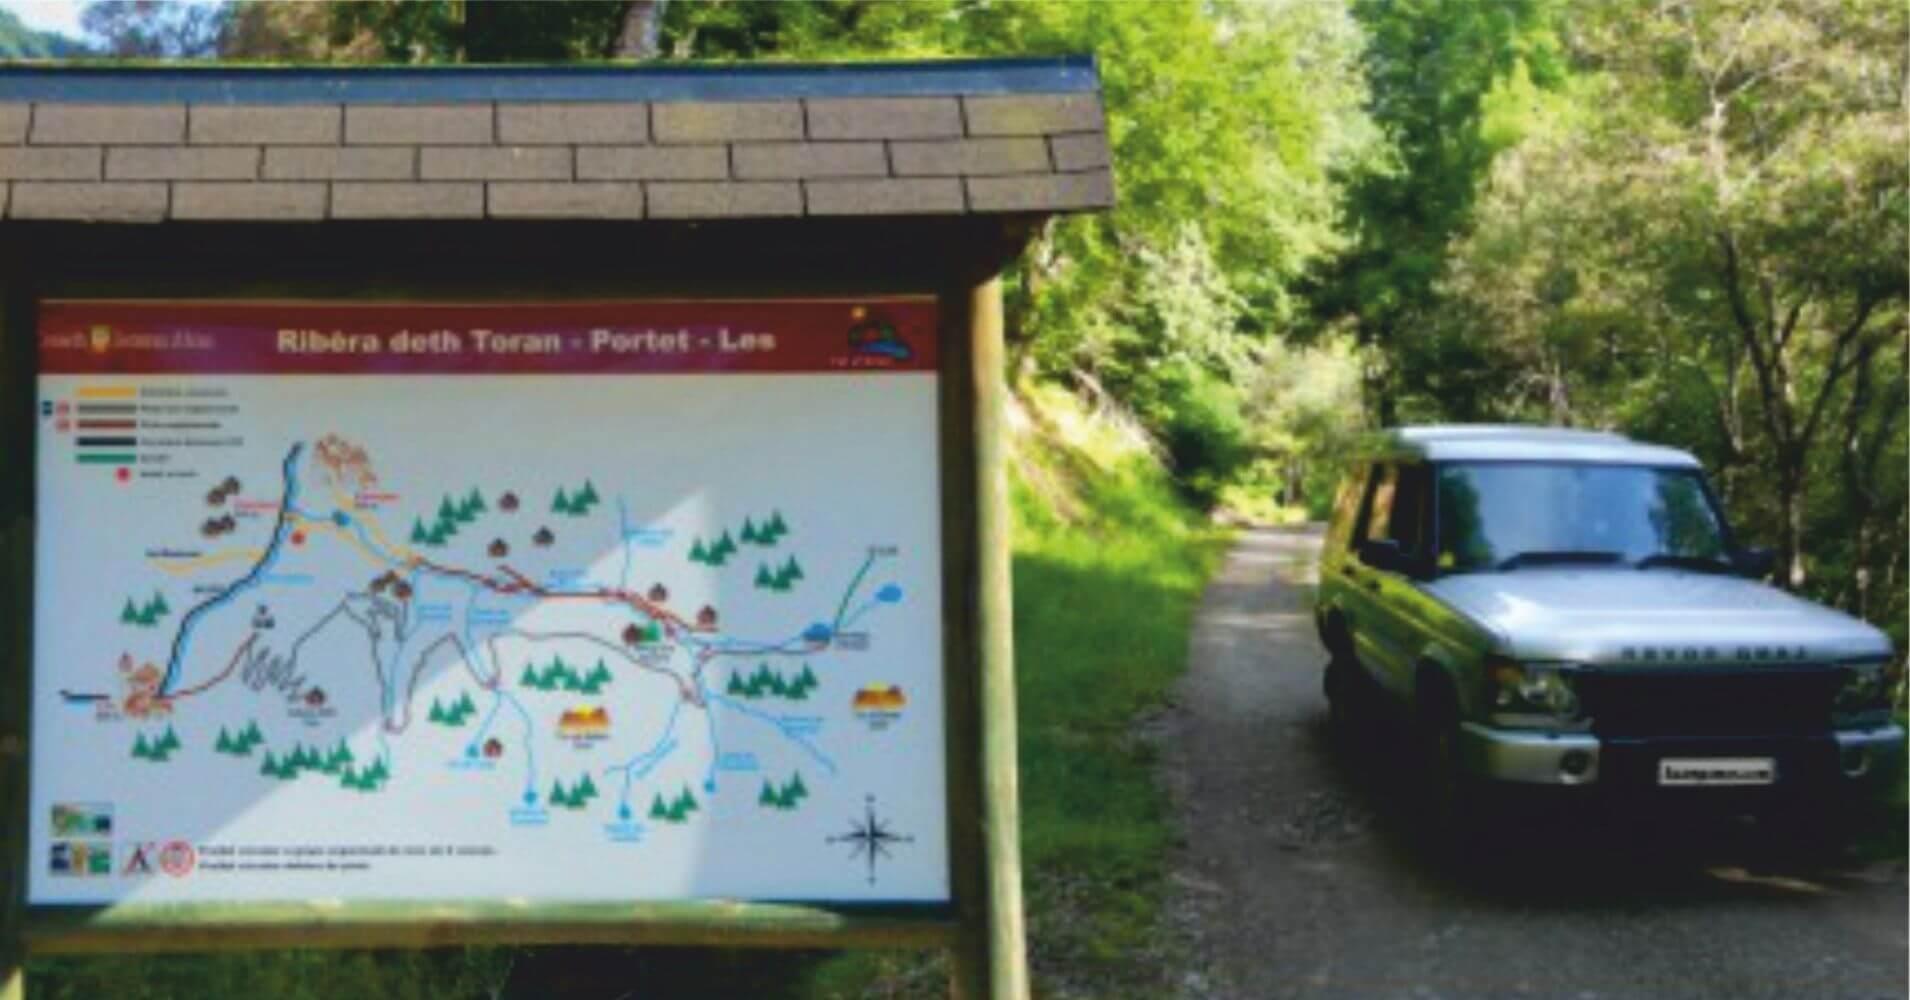 Panel Informativo Ruta 4X4 Valle de Toran. San Joan de Toran. Lérida. Cataluña.